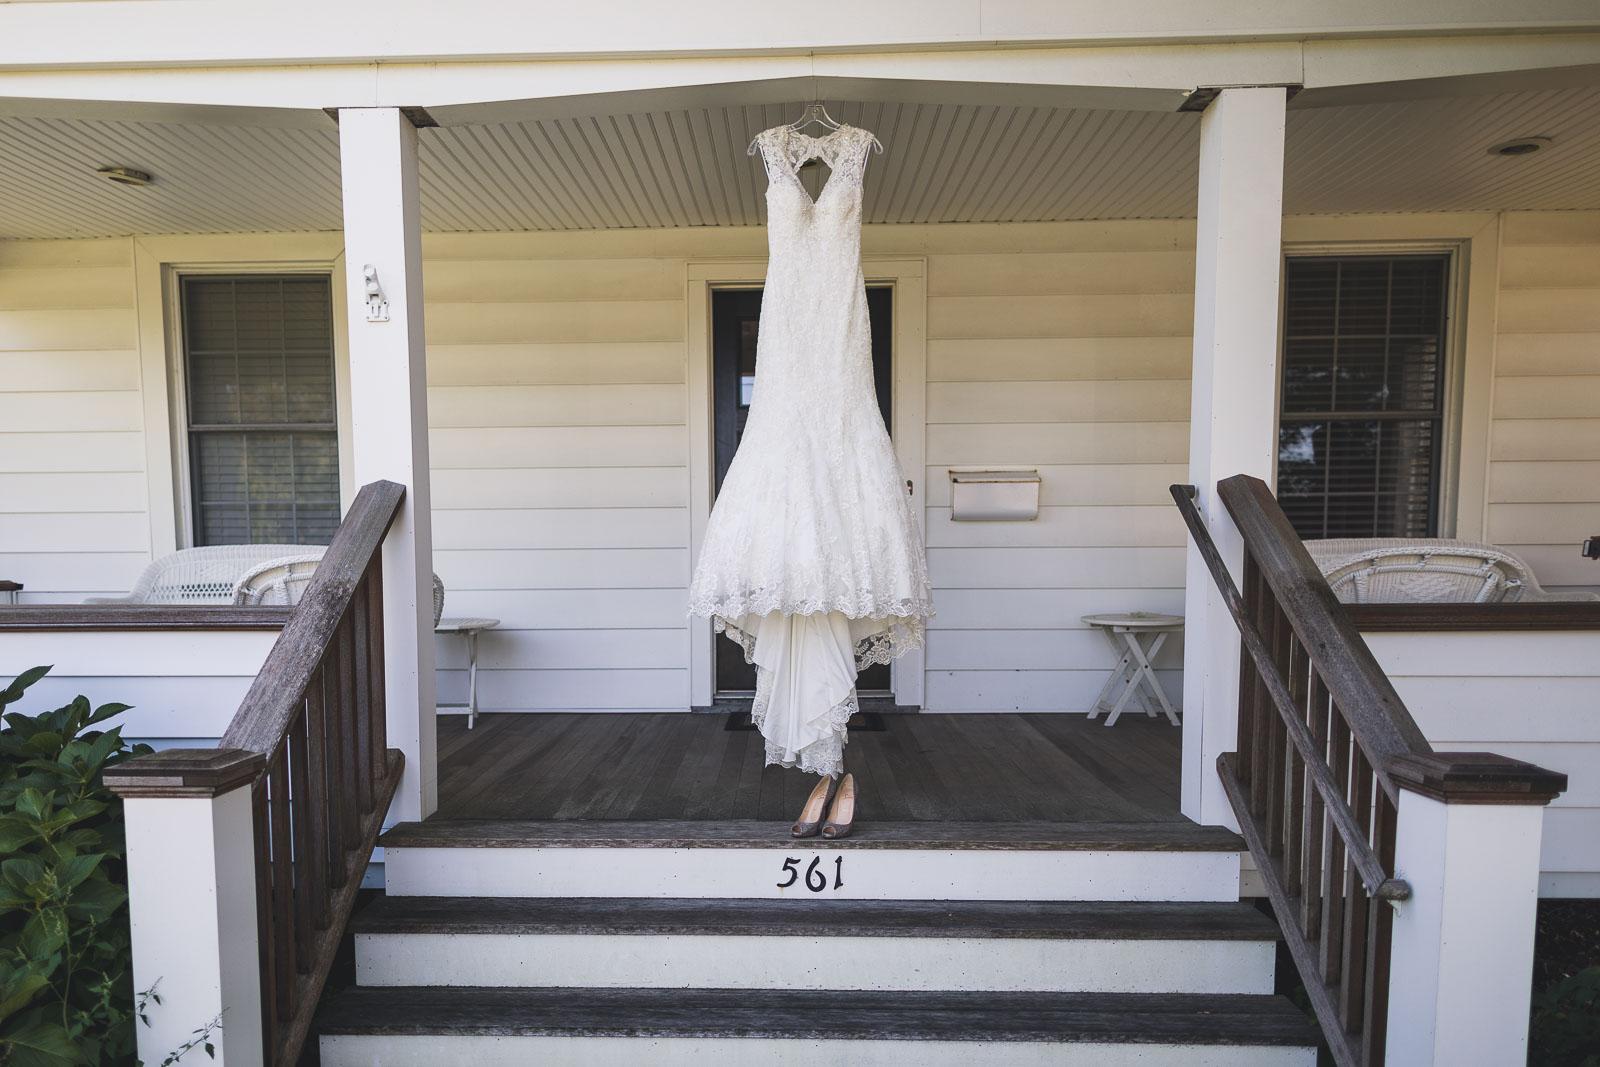 Brides Dress on Porch